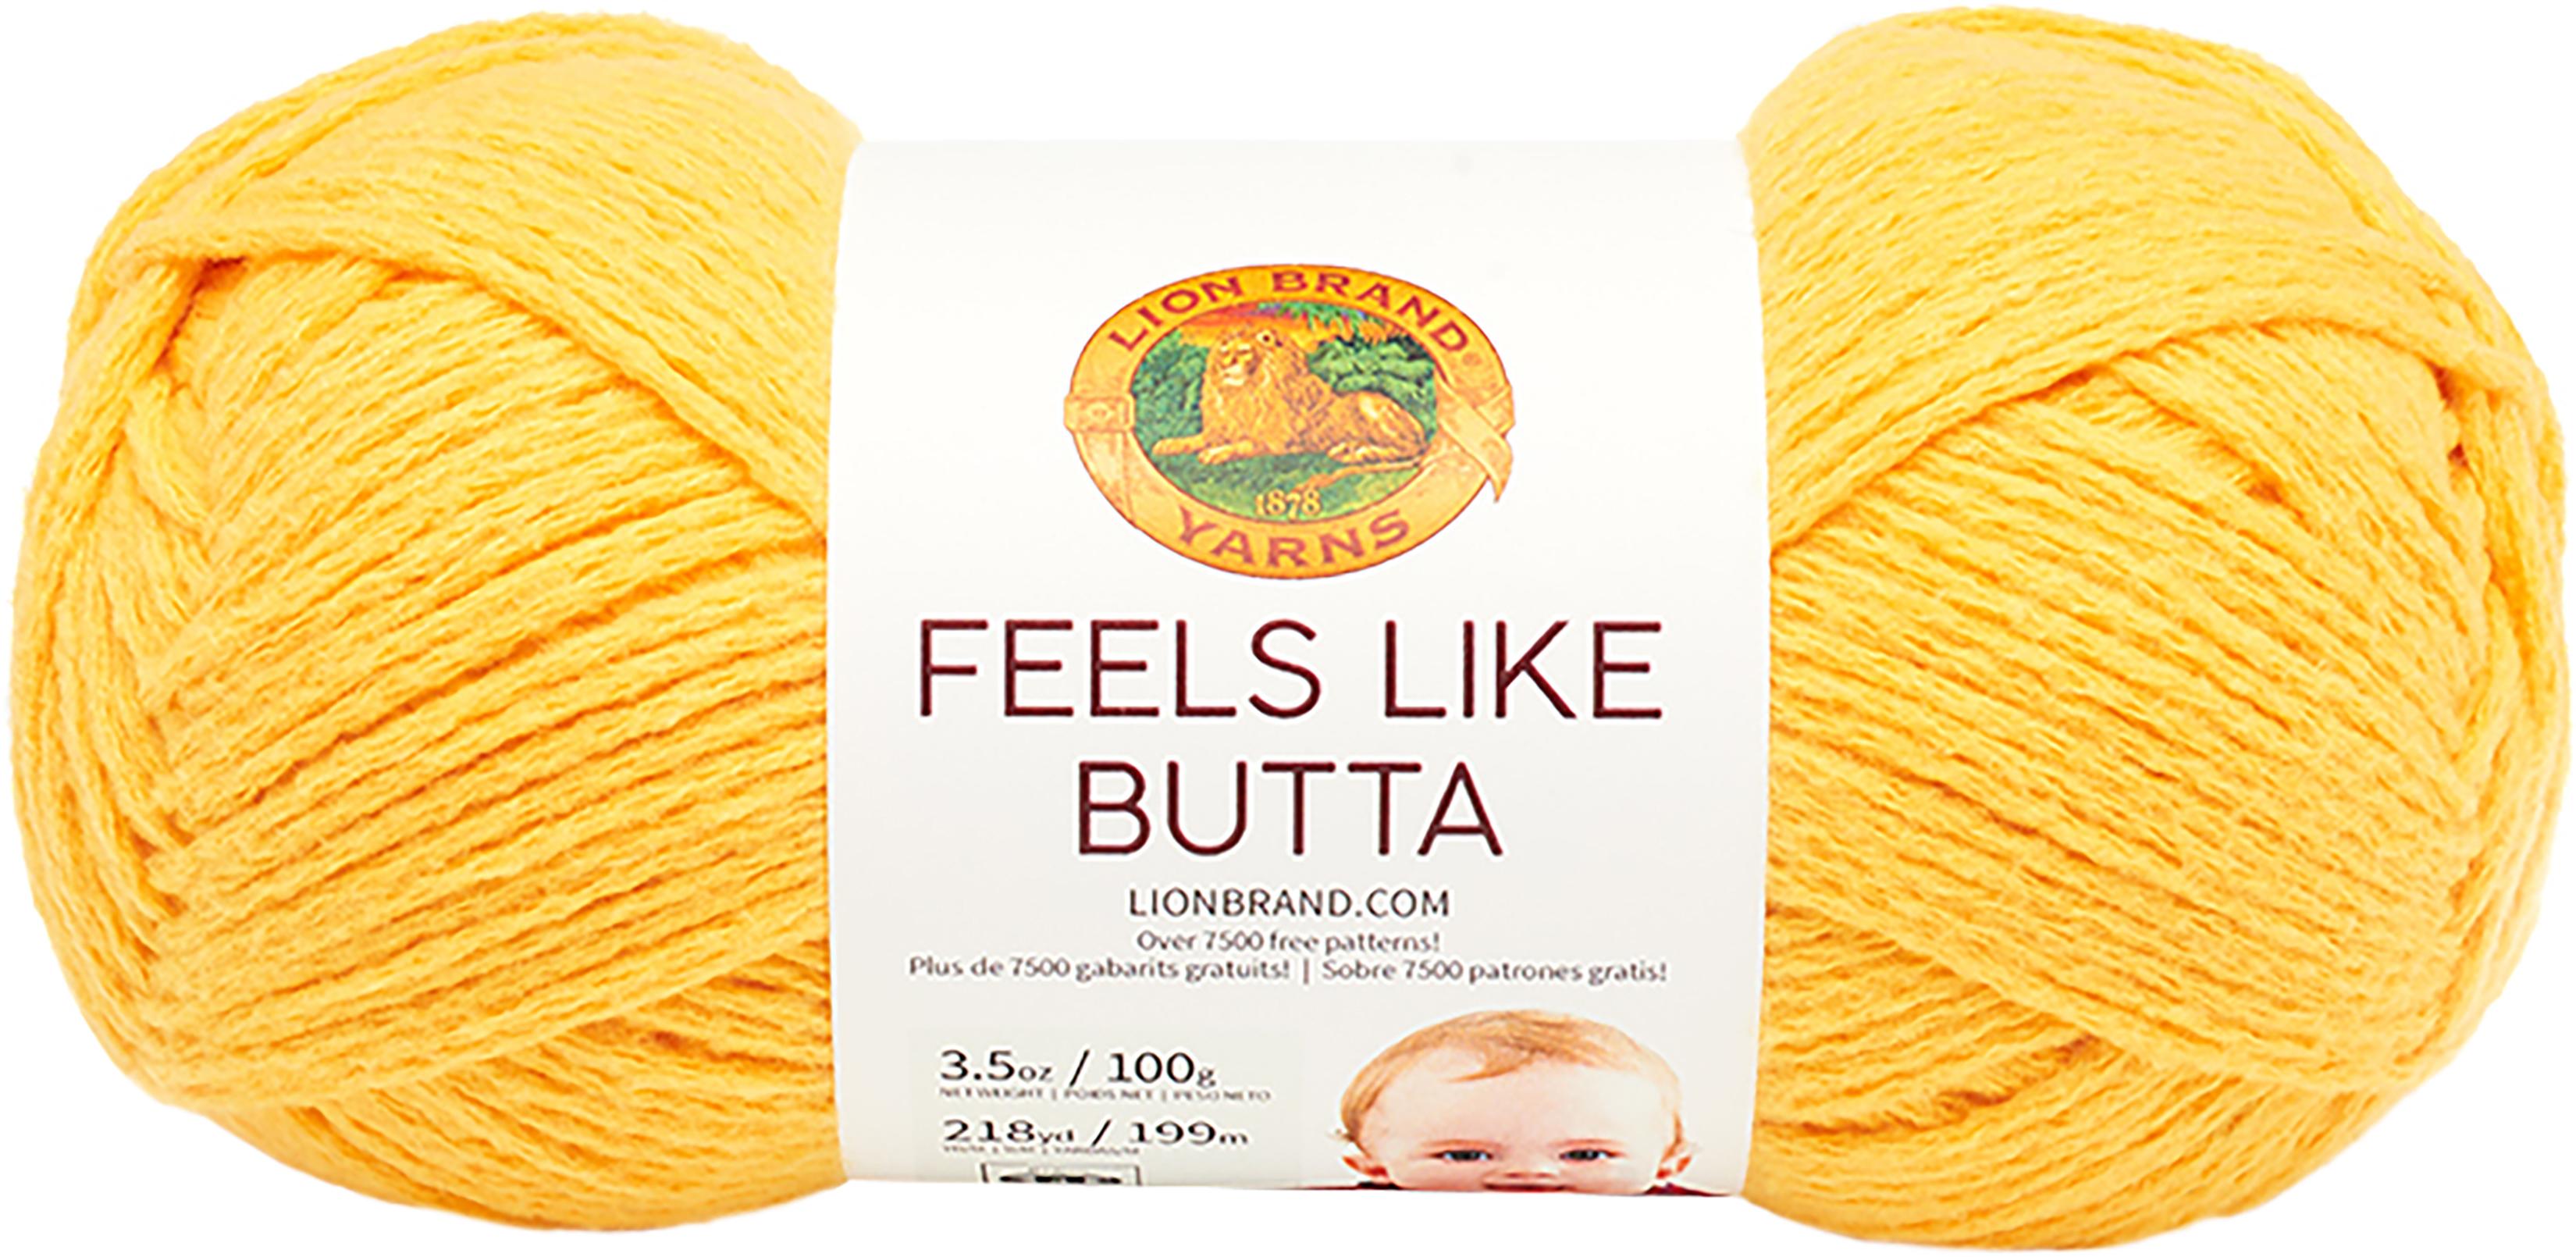 Lion-Brand-Feels-Like-Butta-Yarn-Yellow-Set-Of-3